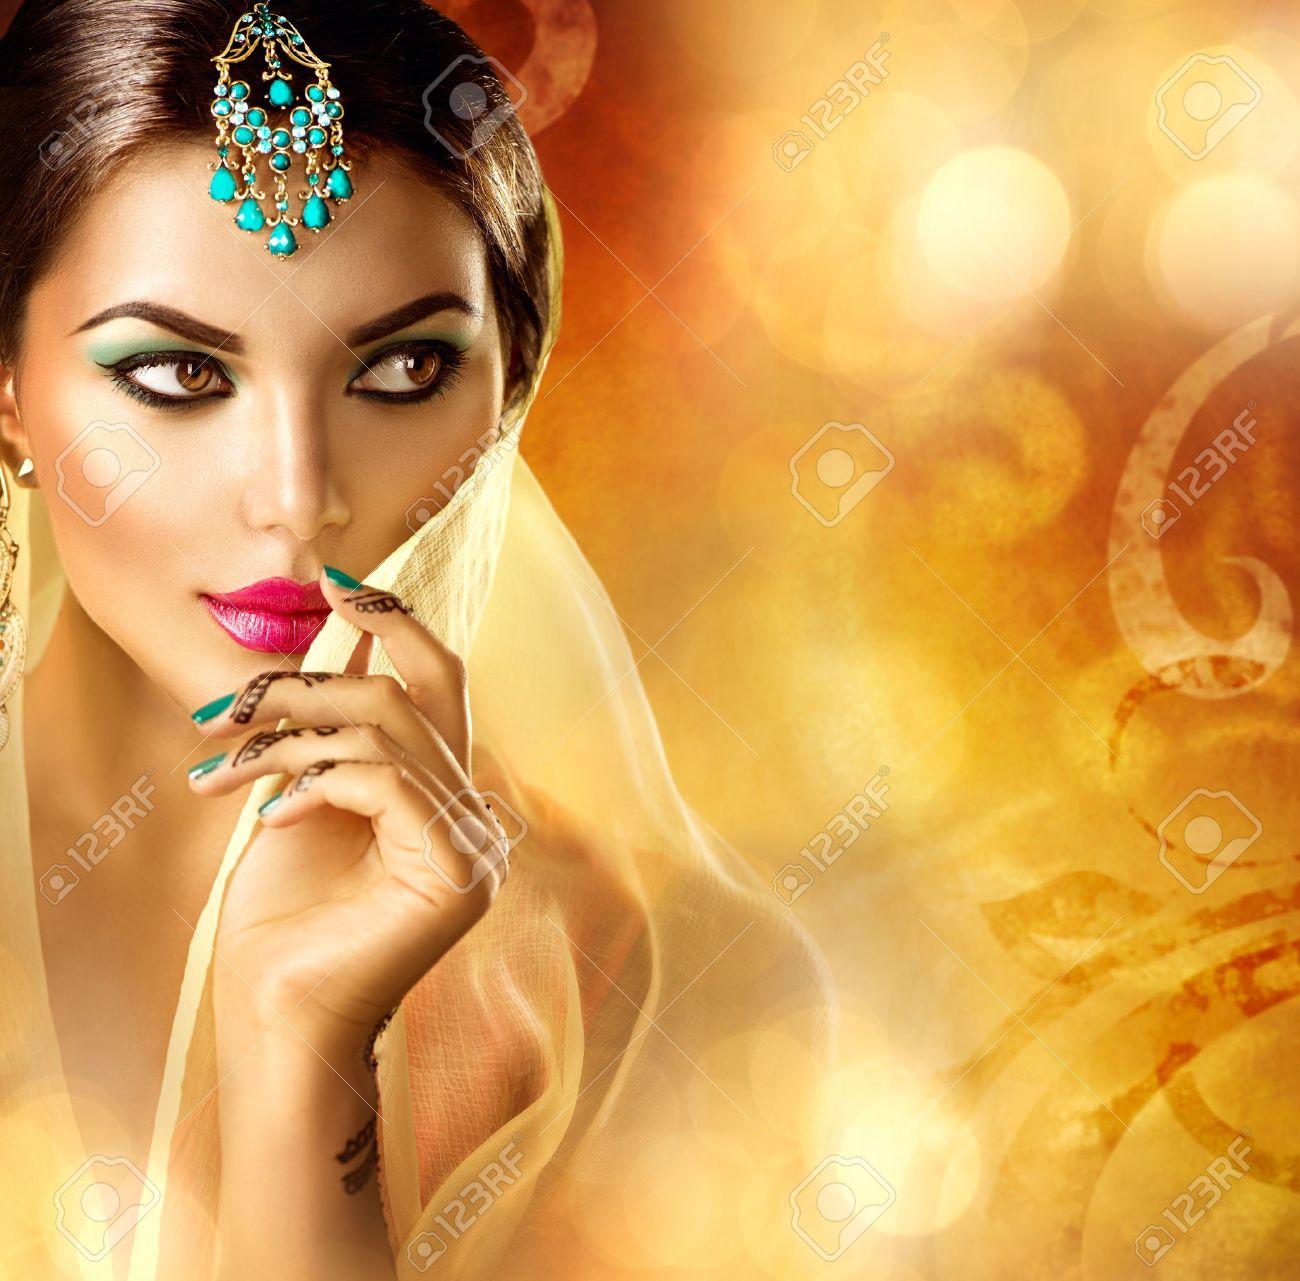 Жаркая арабская девушка